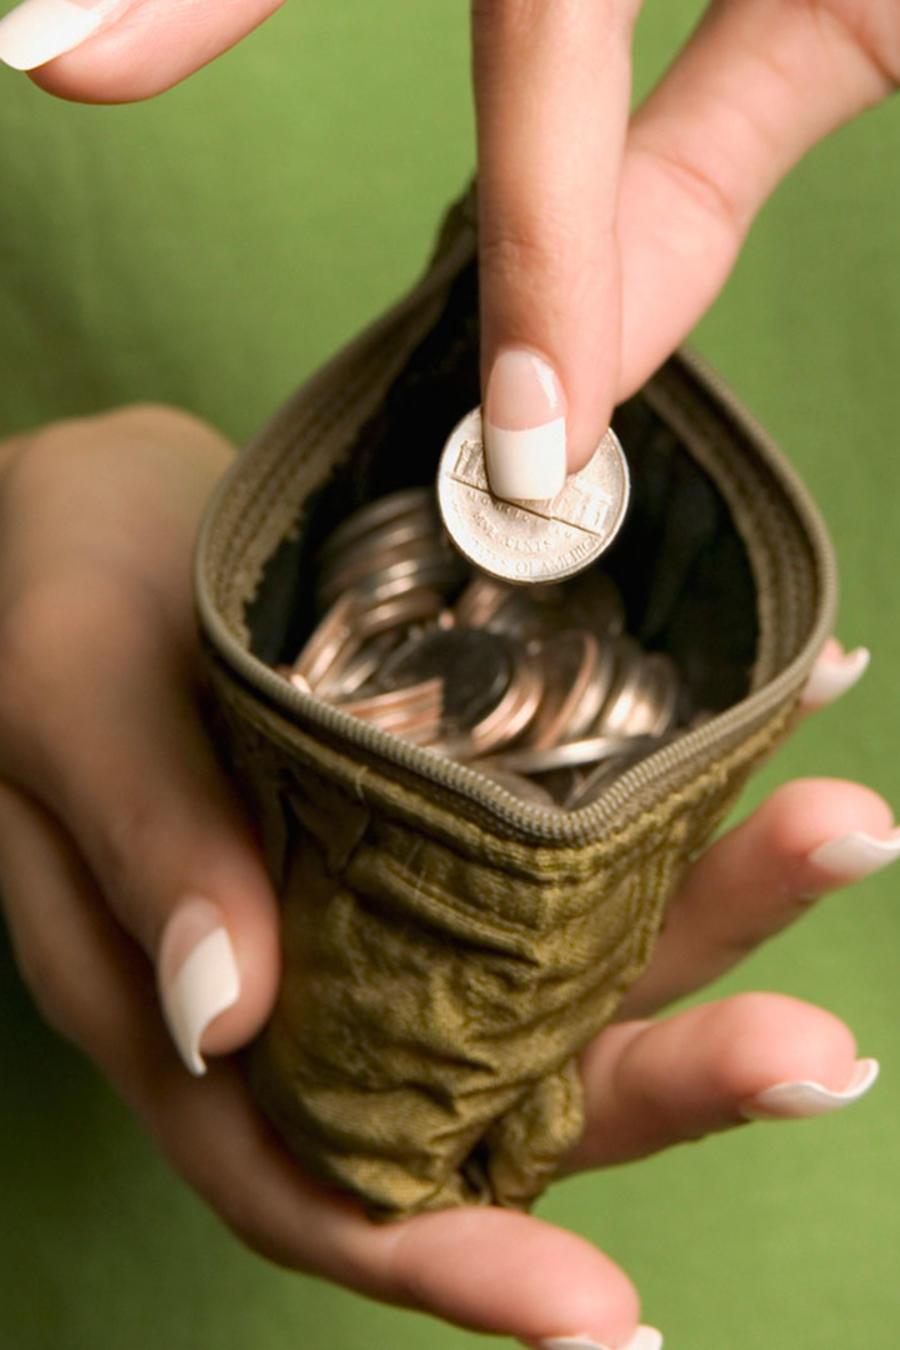 Monedero con monedas